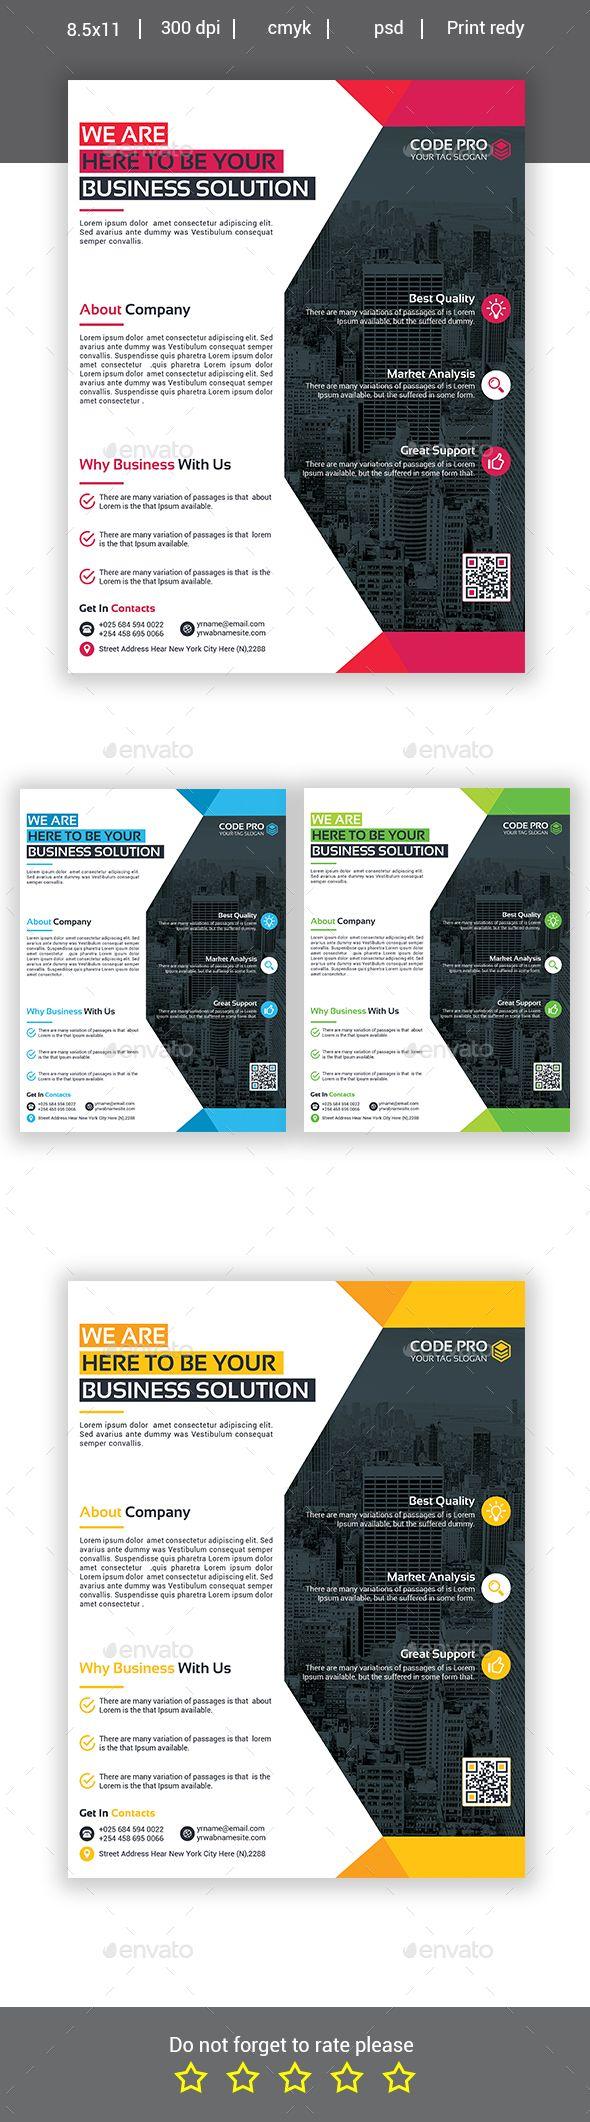 Business Flyer Design - Corporate Flyer Template PSD. Download here: https://graphicriver.net/item/business-flyer/16930530?s_rank=74&ref=yinkira